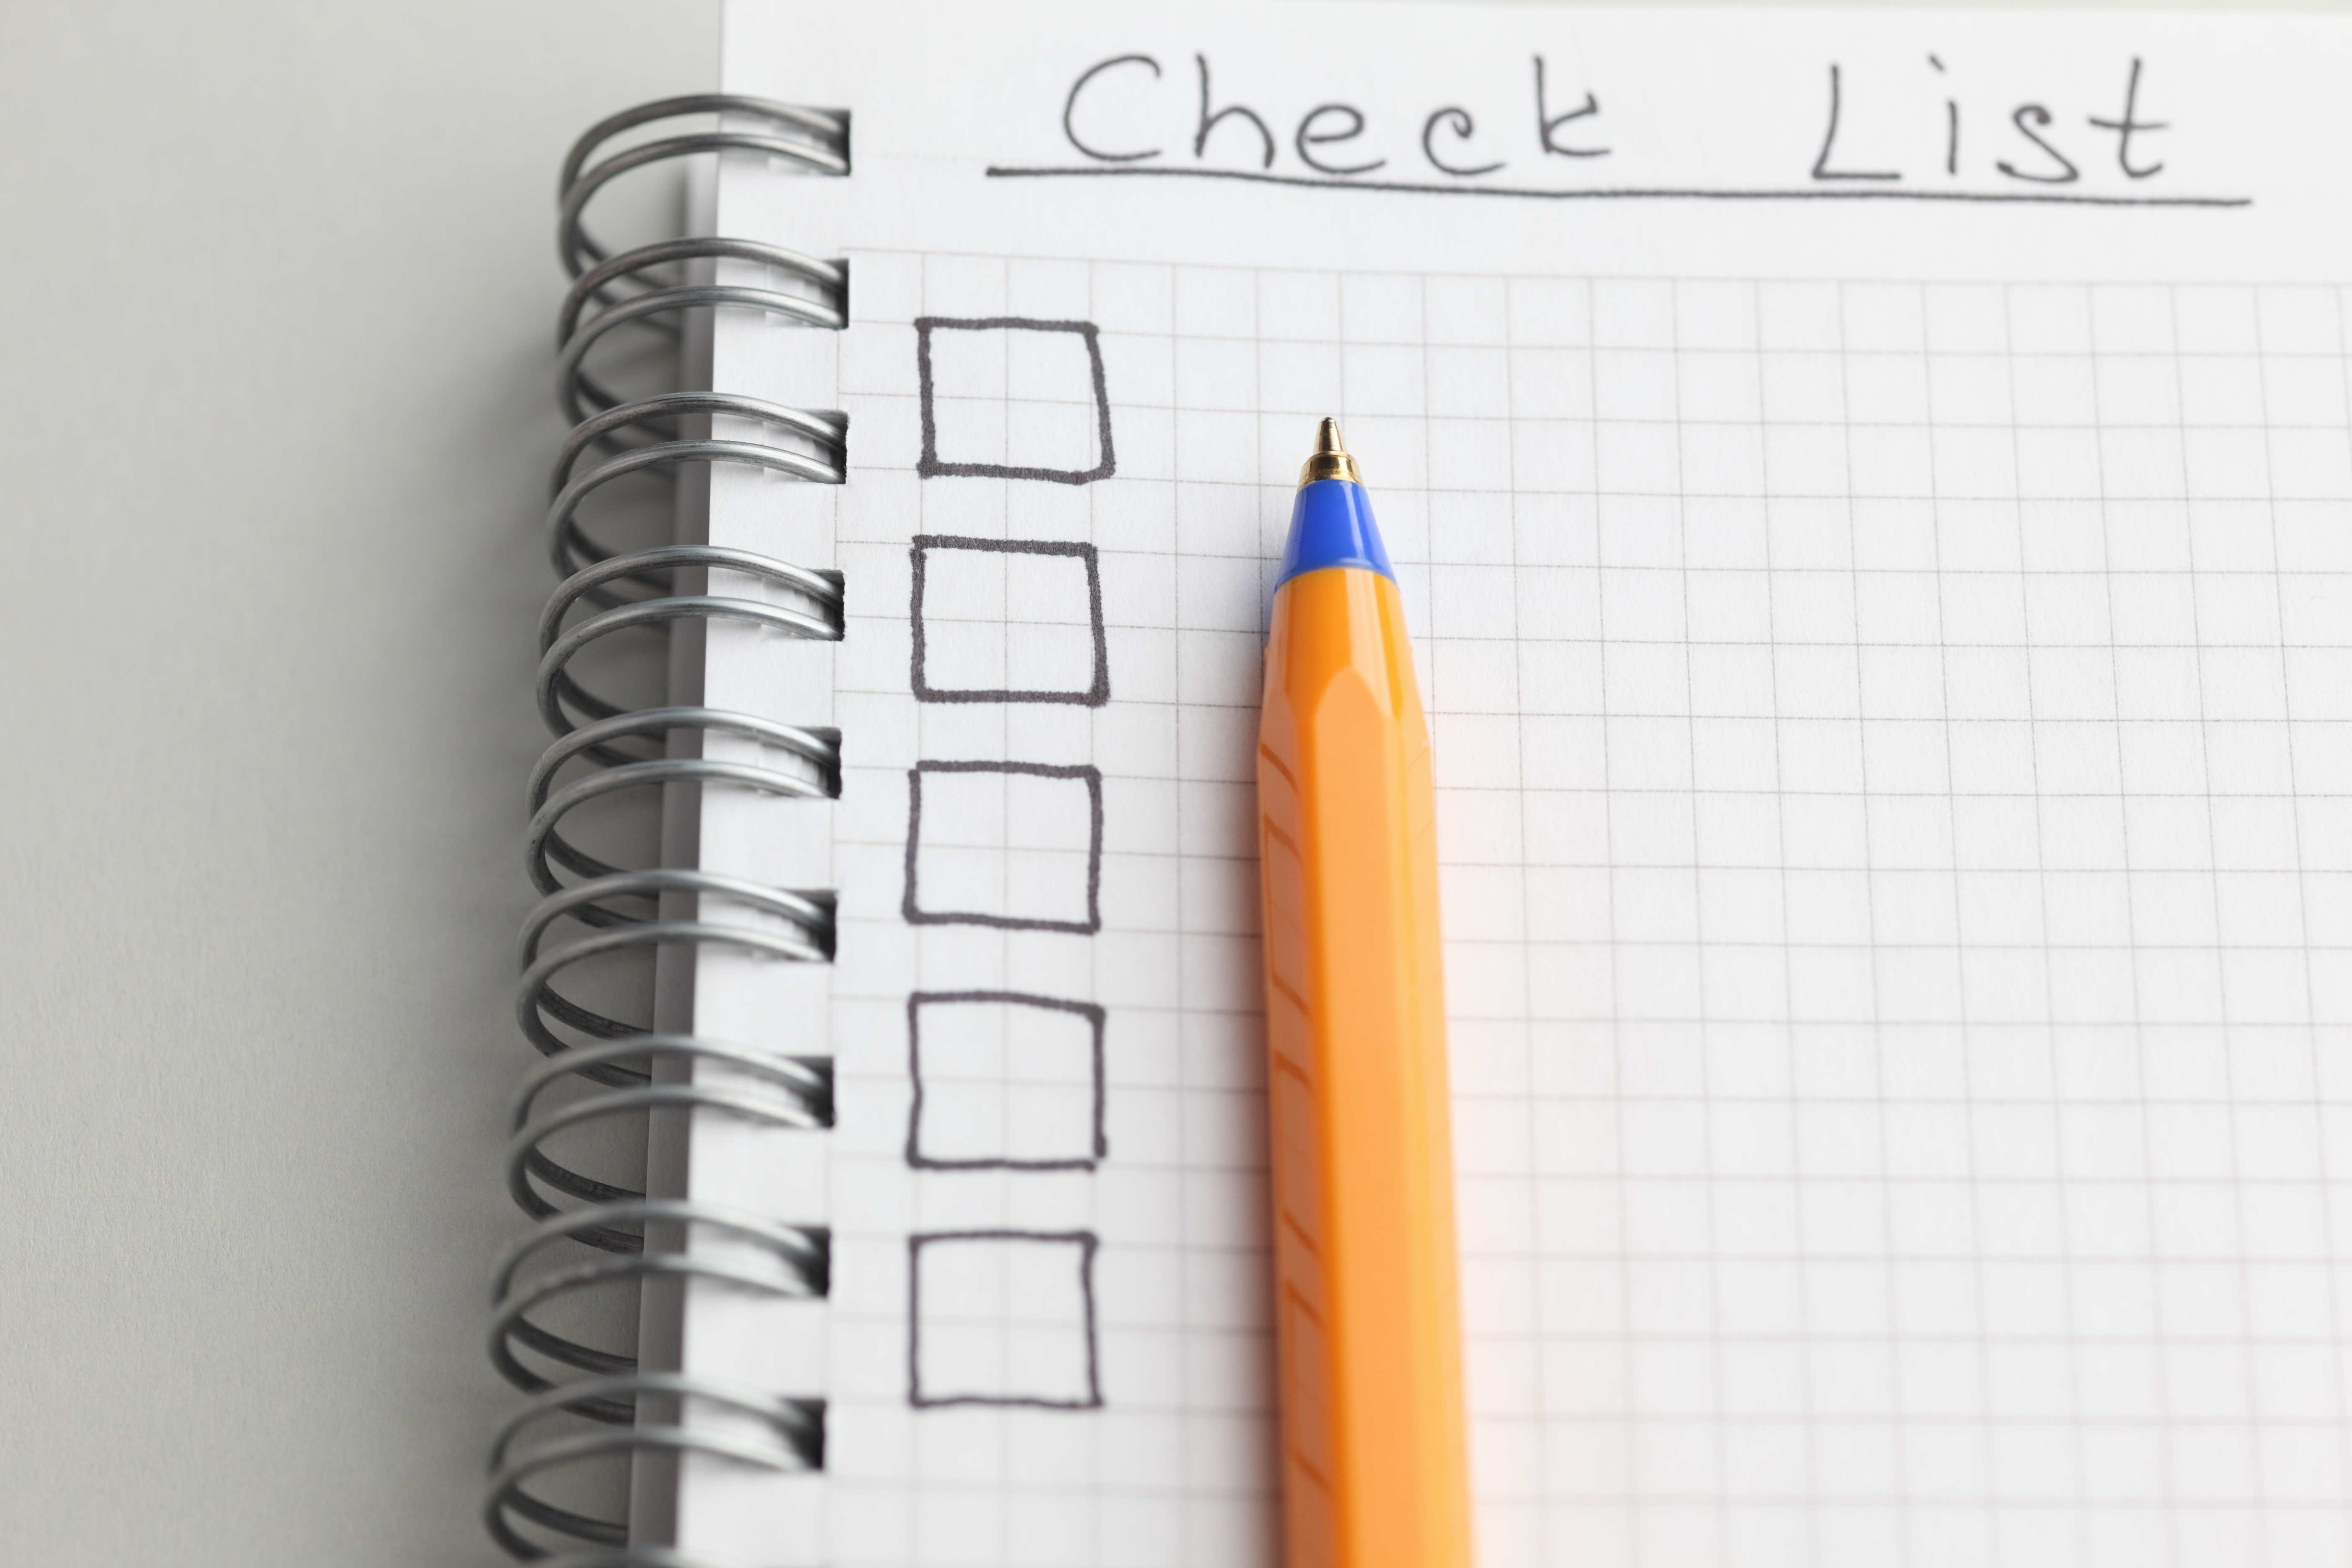 Write a checklist